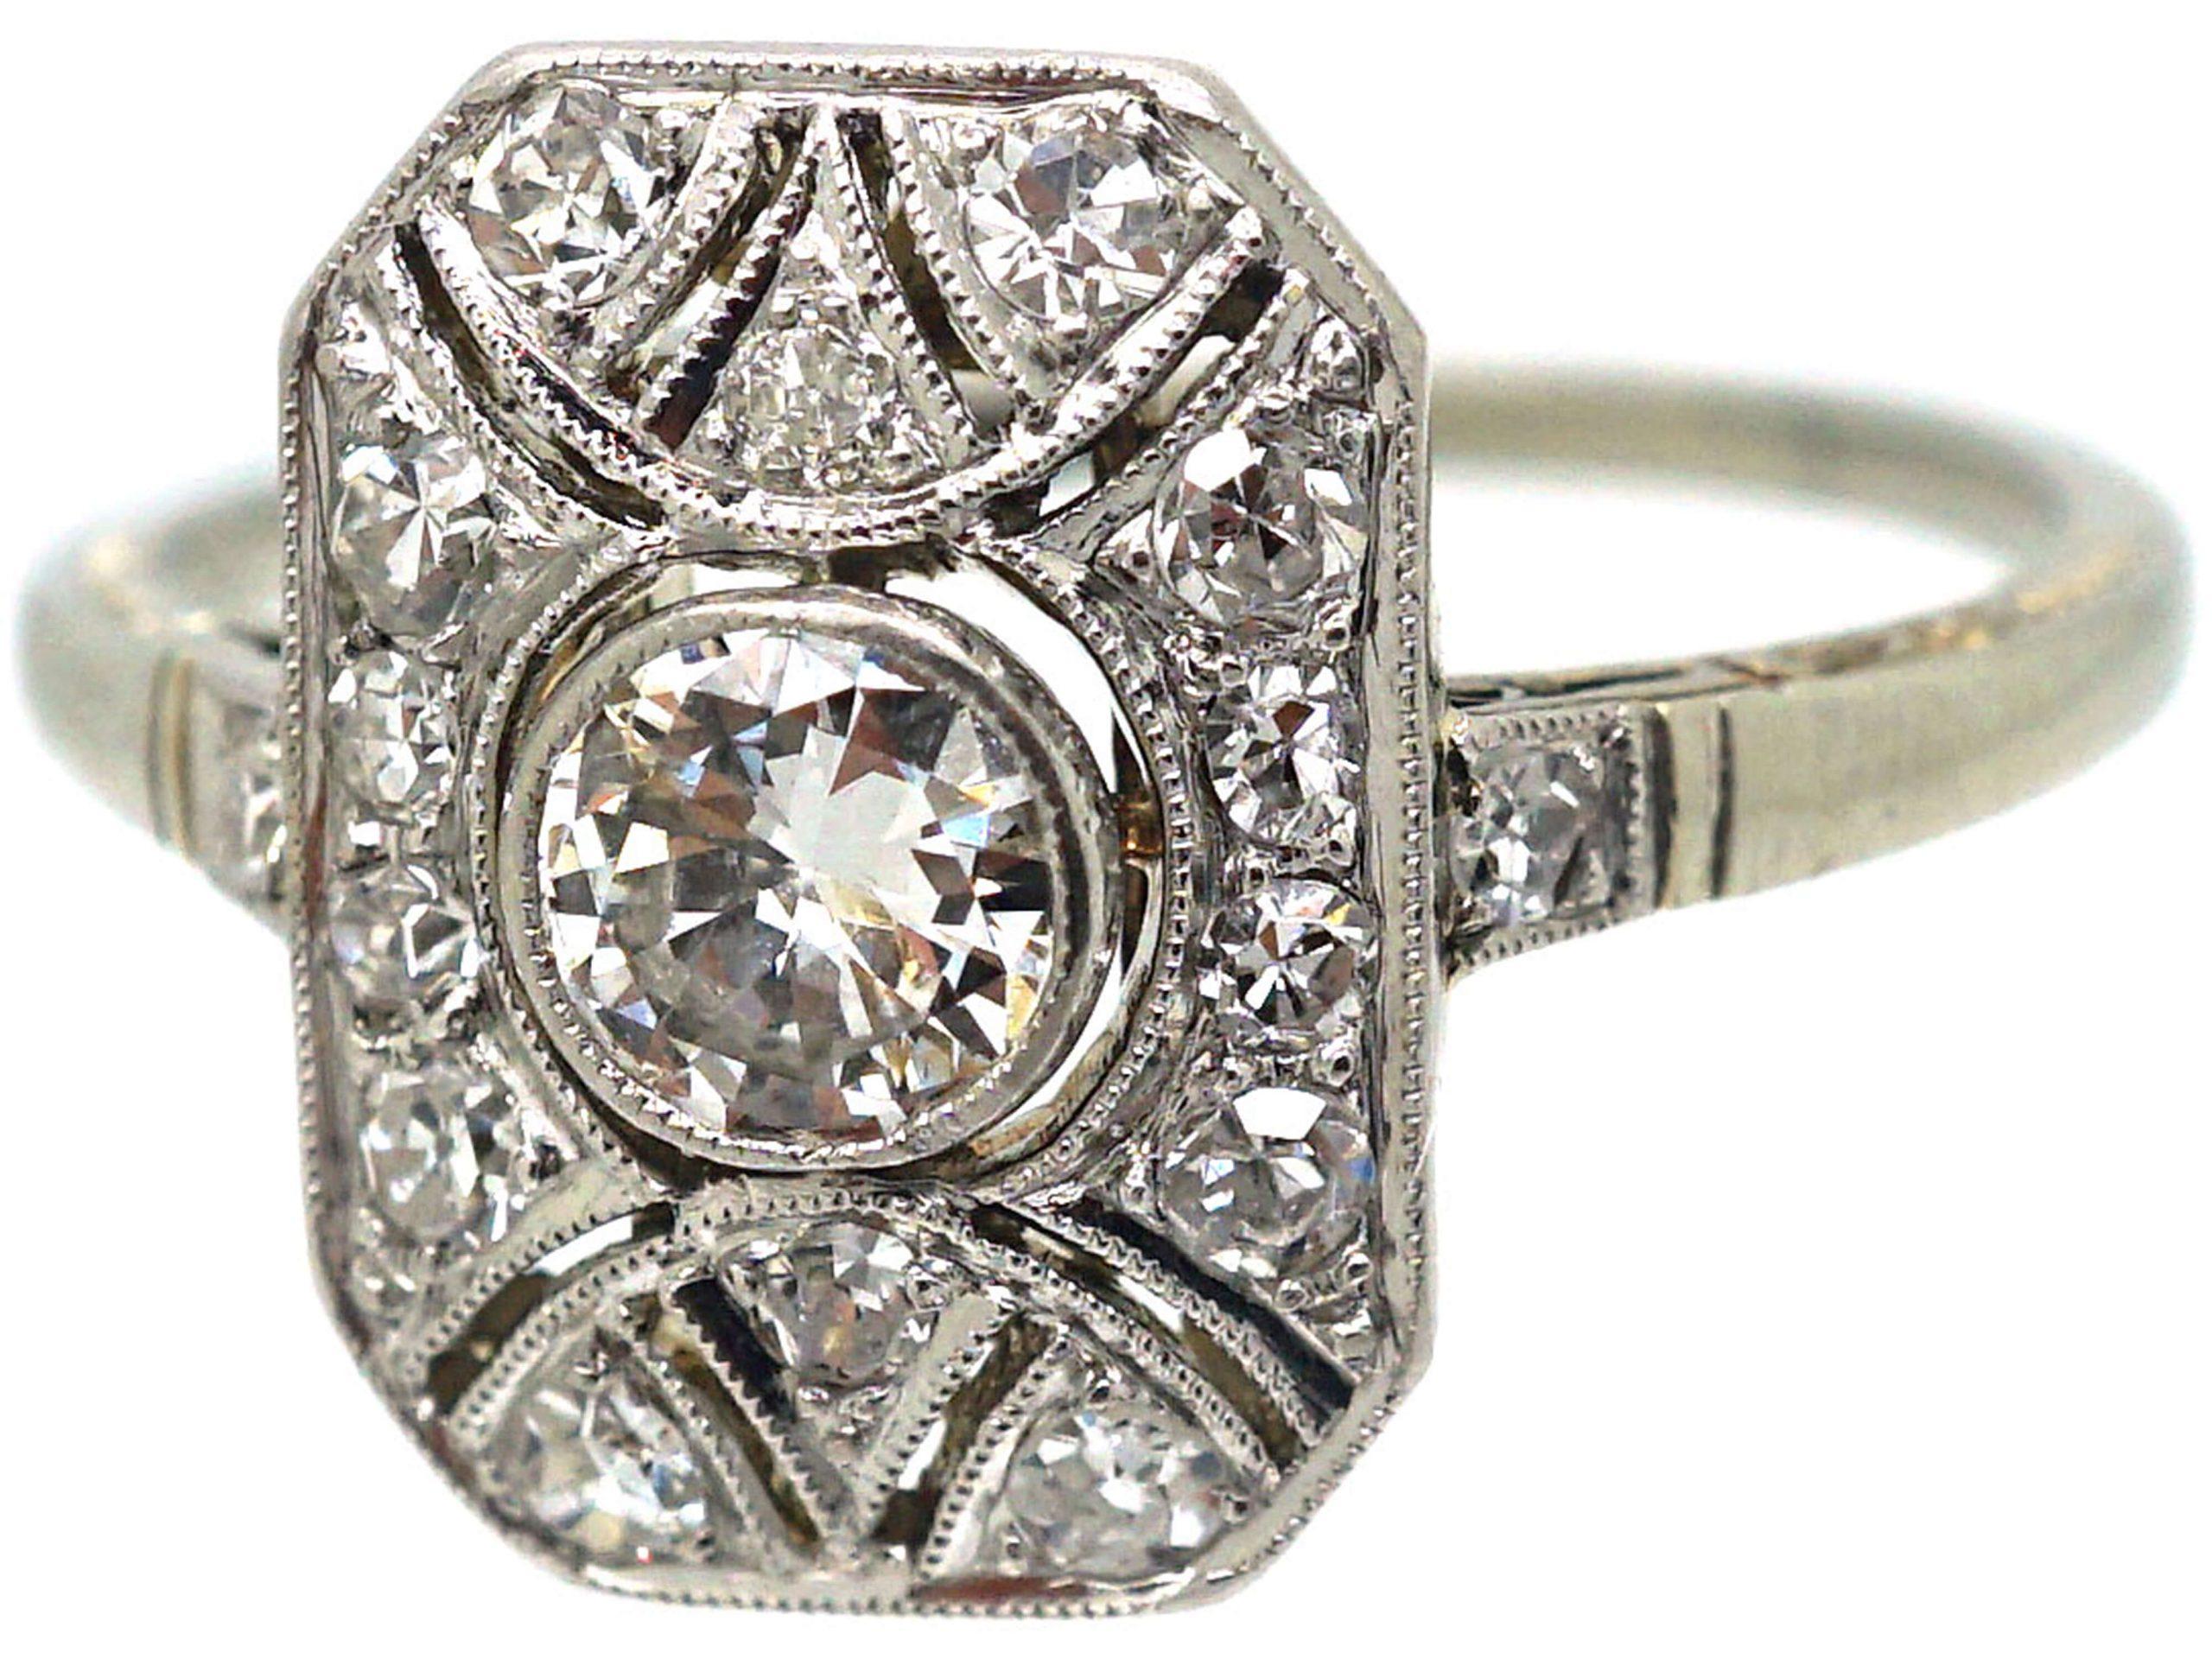 Art Deco 18ct White Gold Rectangular Shaped Ring set with Diamonds